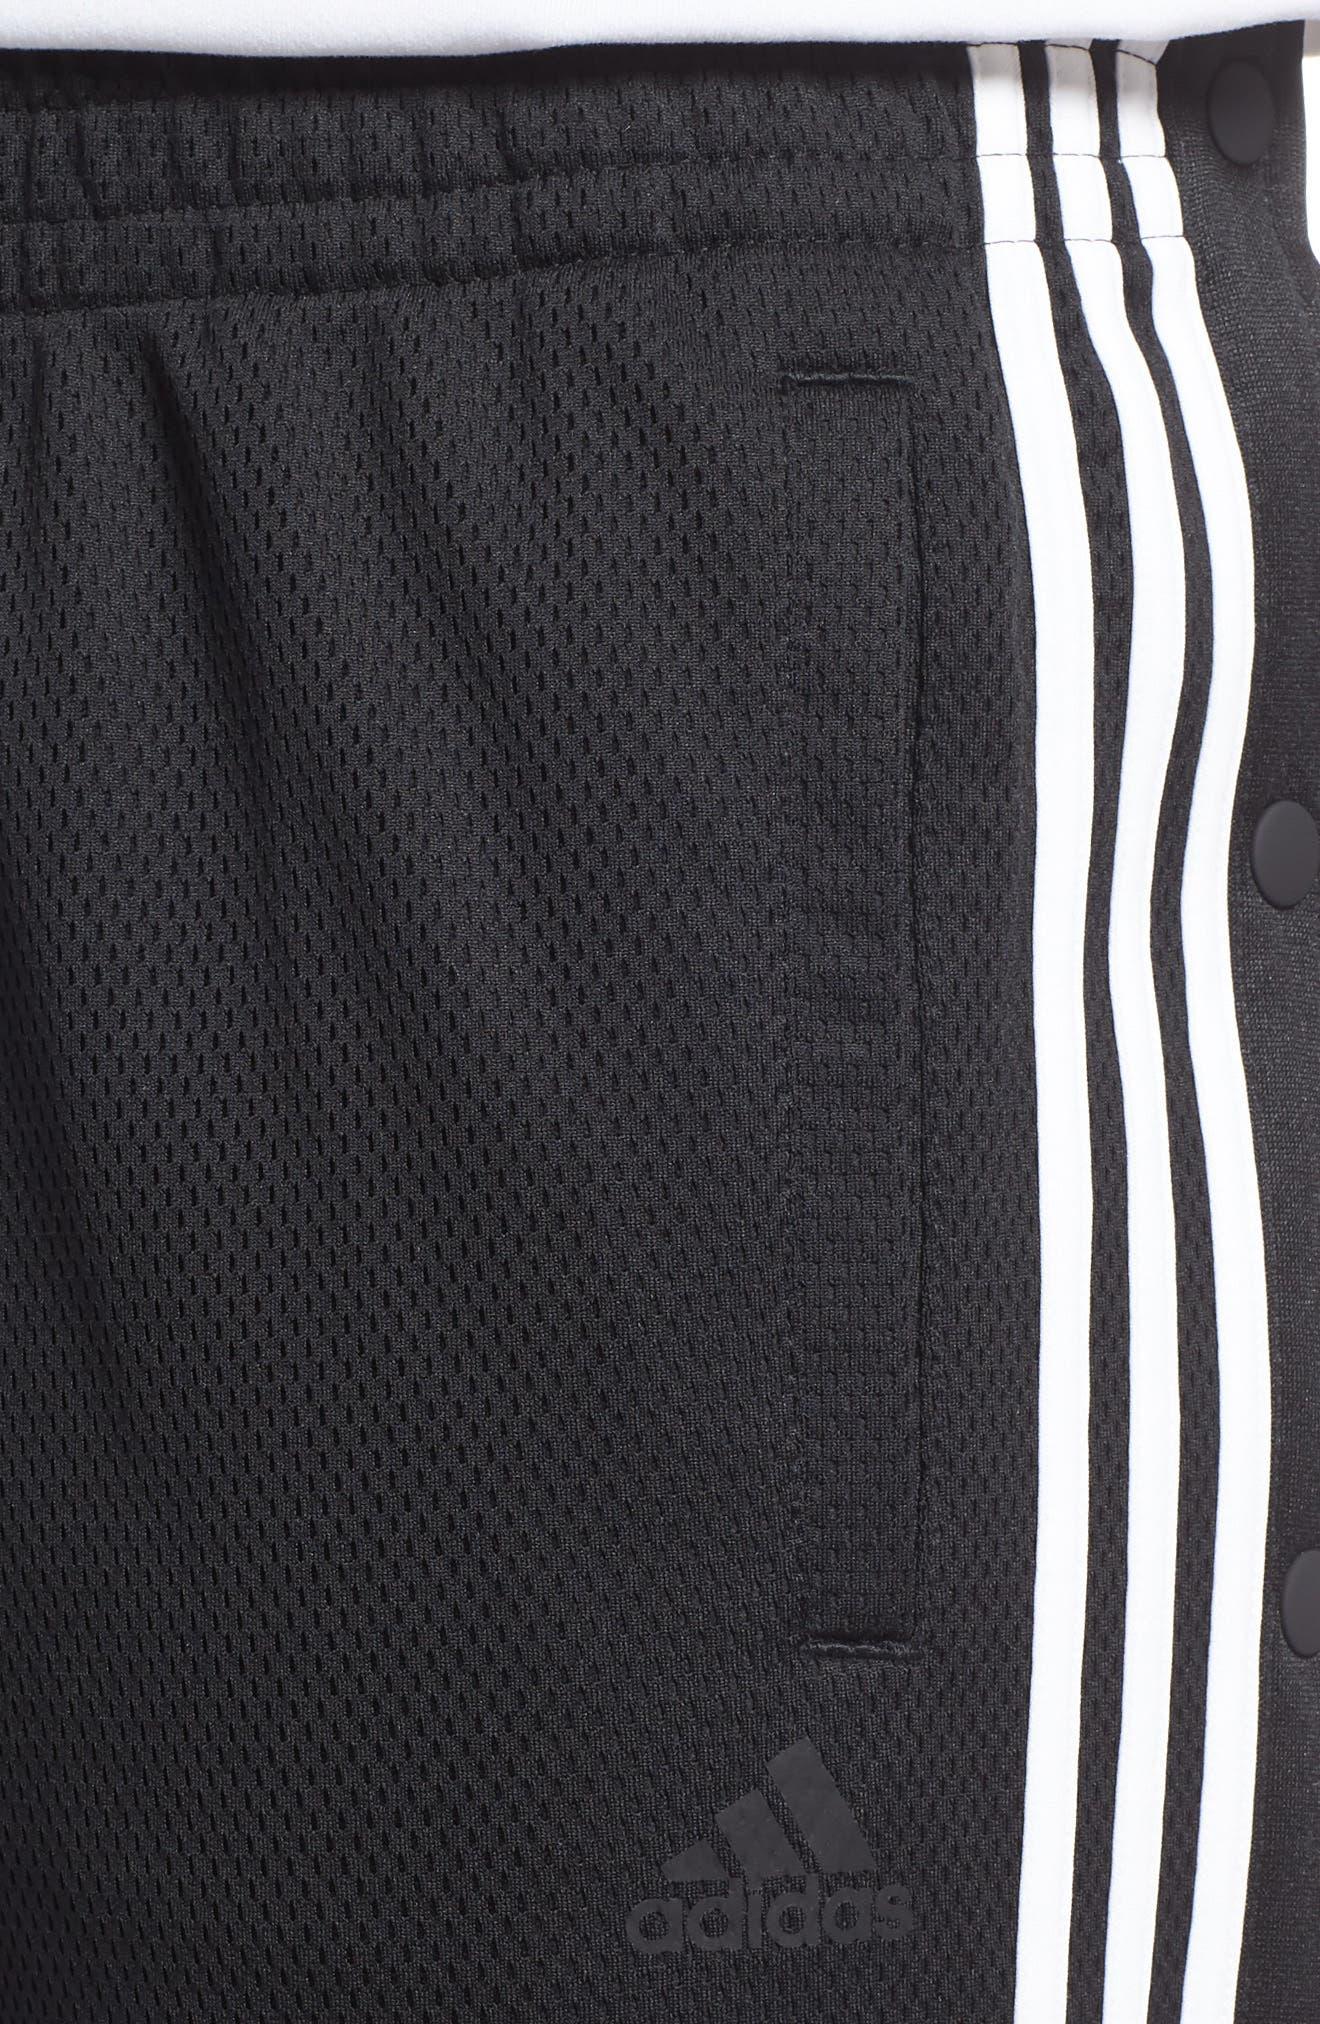 ID Tearaway Track Pants,                             Alternate thumbnail 5, color,                             Black